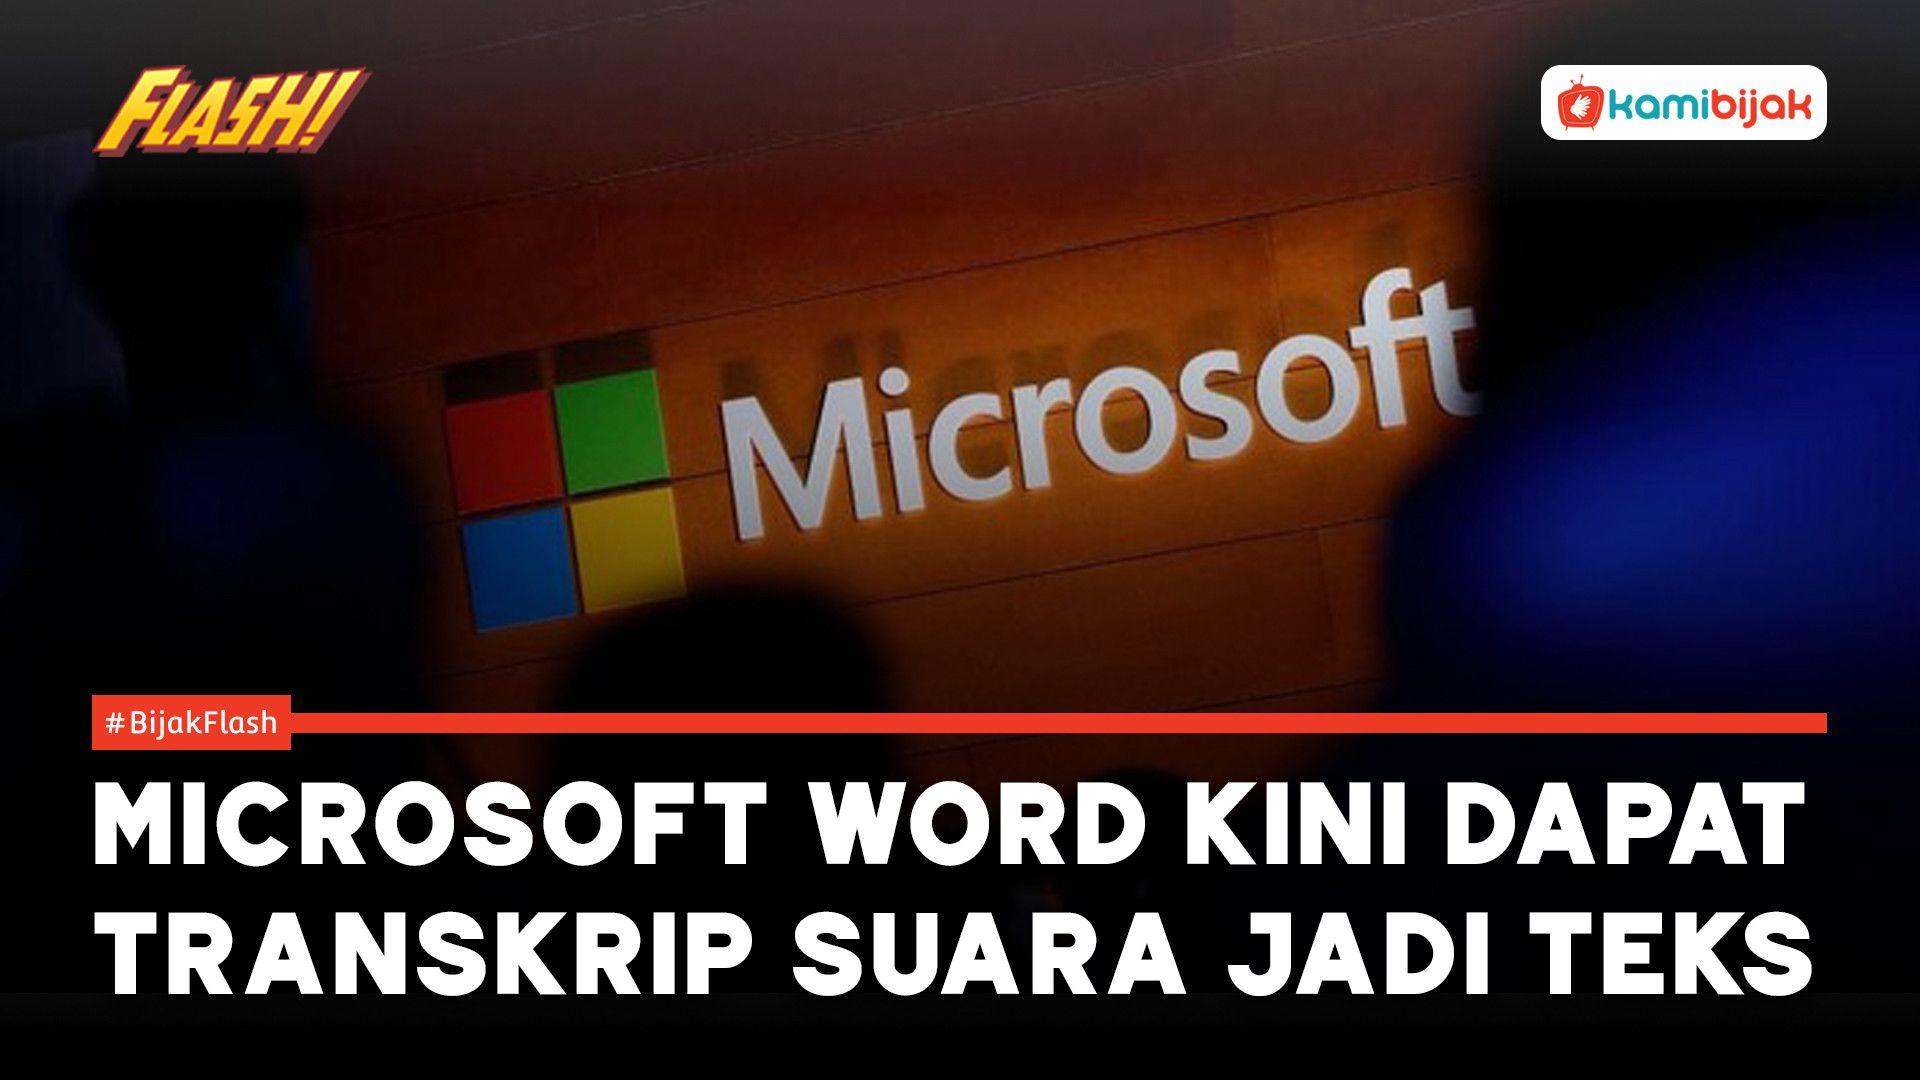 Microsoft Word Kini Dapat Transkrip Suara Jadi Teks Kamibijakid Genggamduniatanpasuara Kbupdate Teks Microsoft Transkripsi